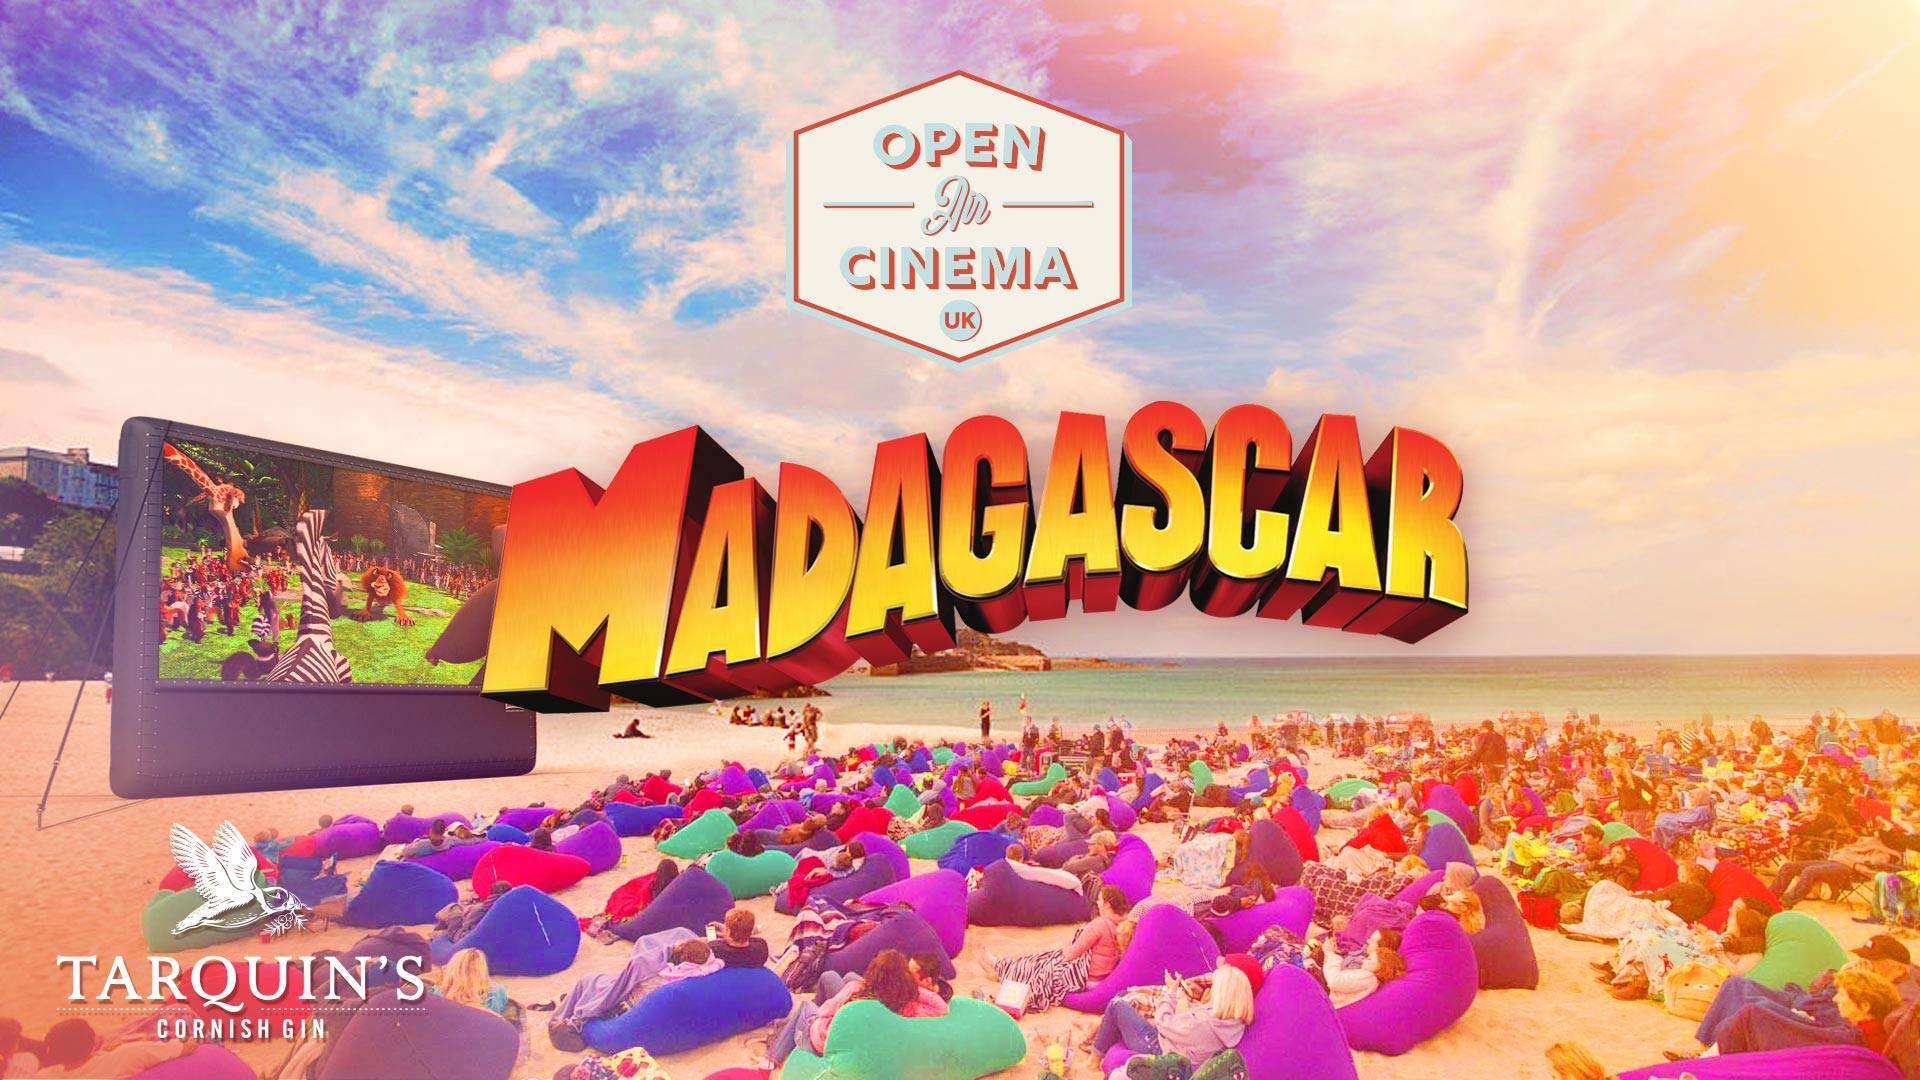 Tarquin's Present: Madagascar at Porthminster Beach